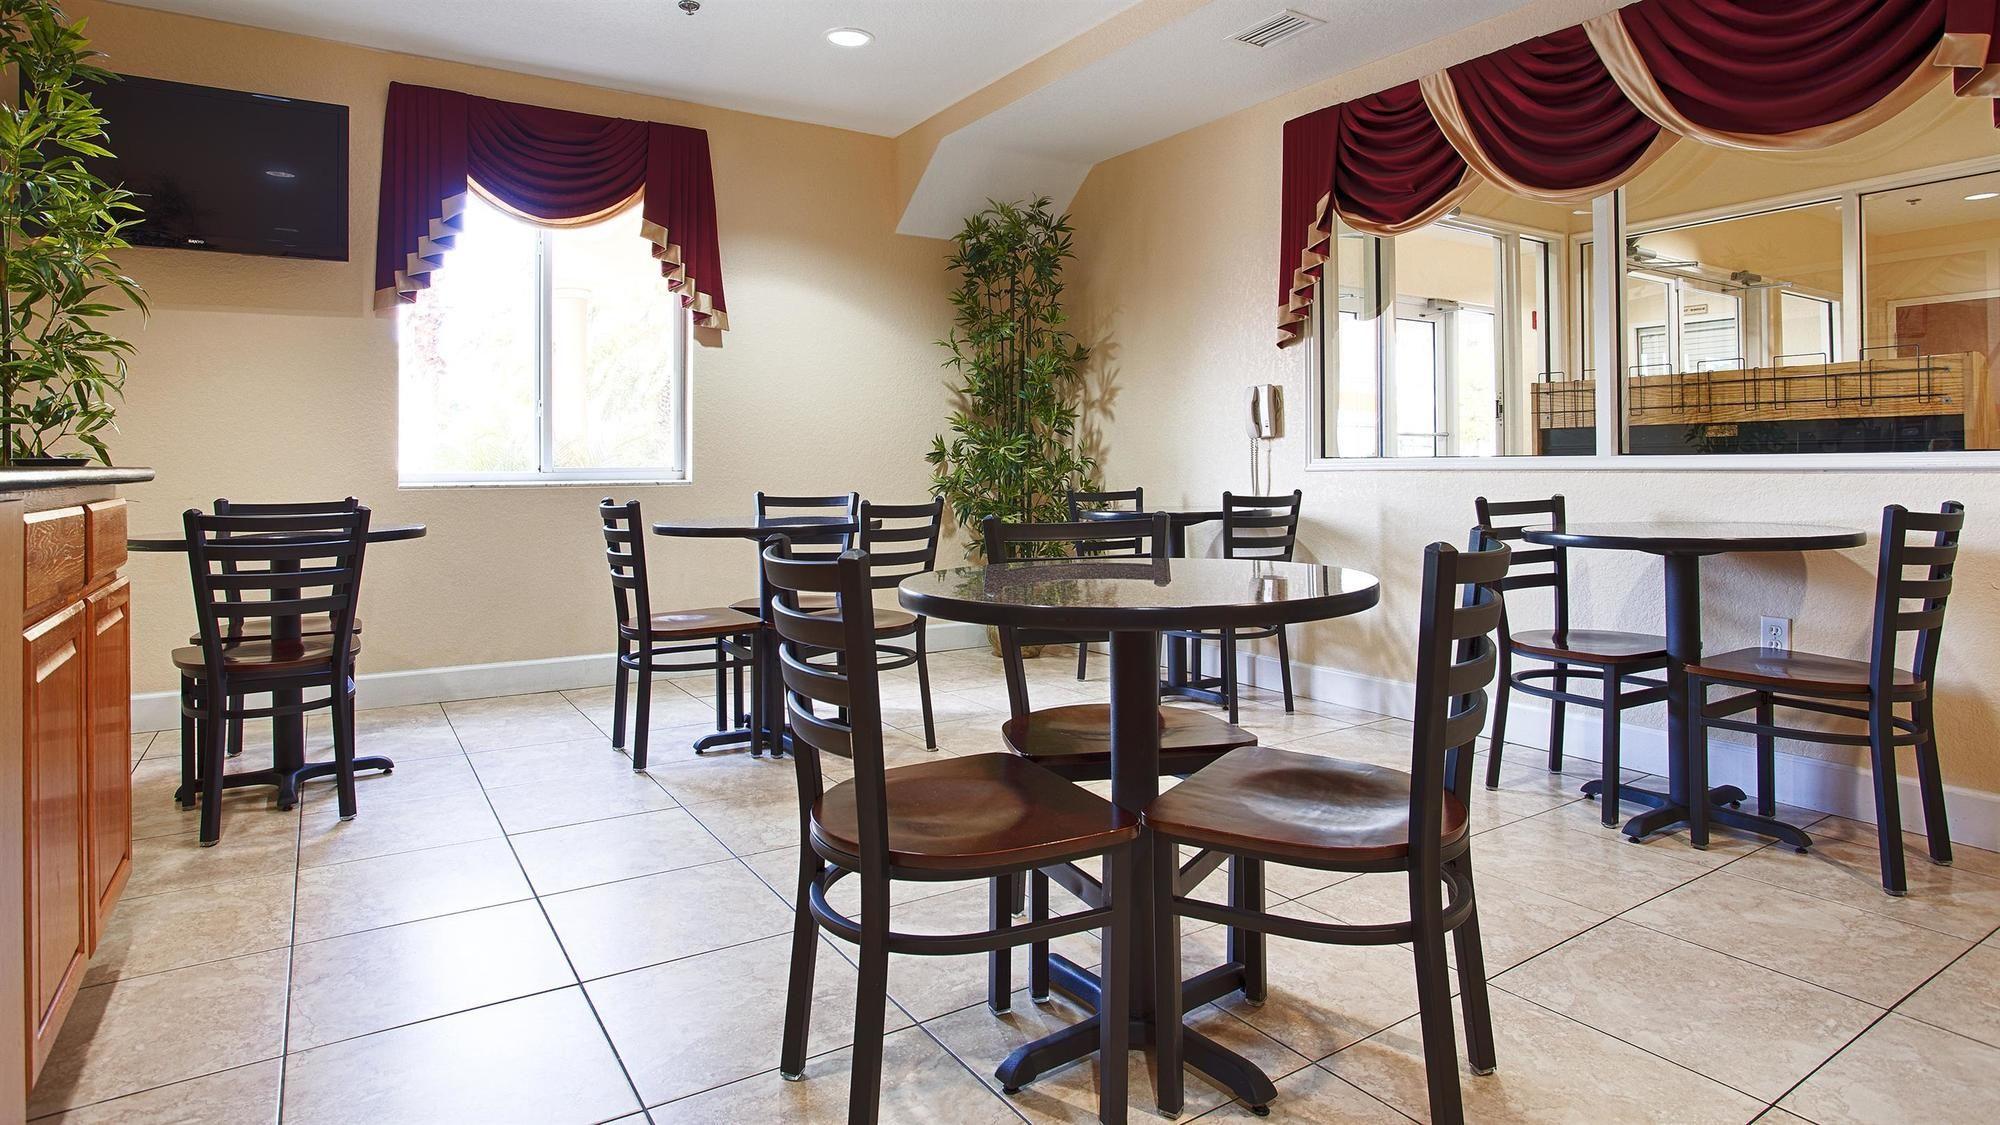 Best Western Edgewater Inn in Edgewater, FL